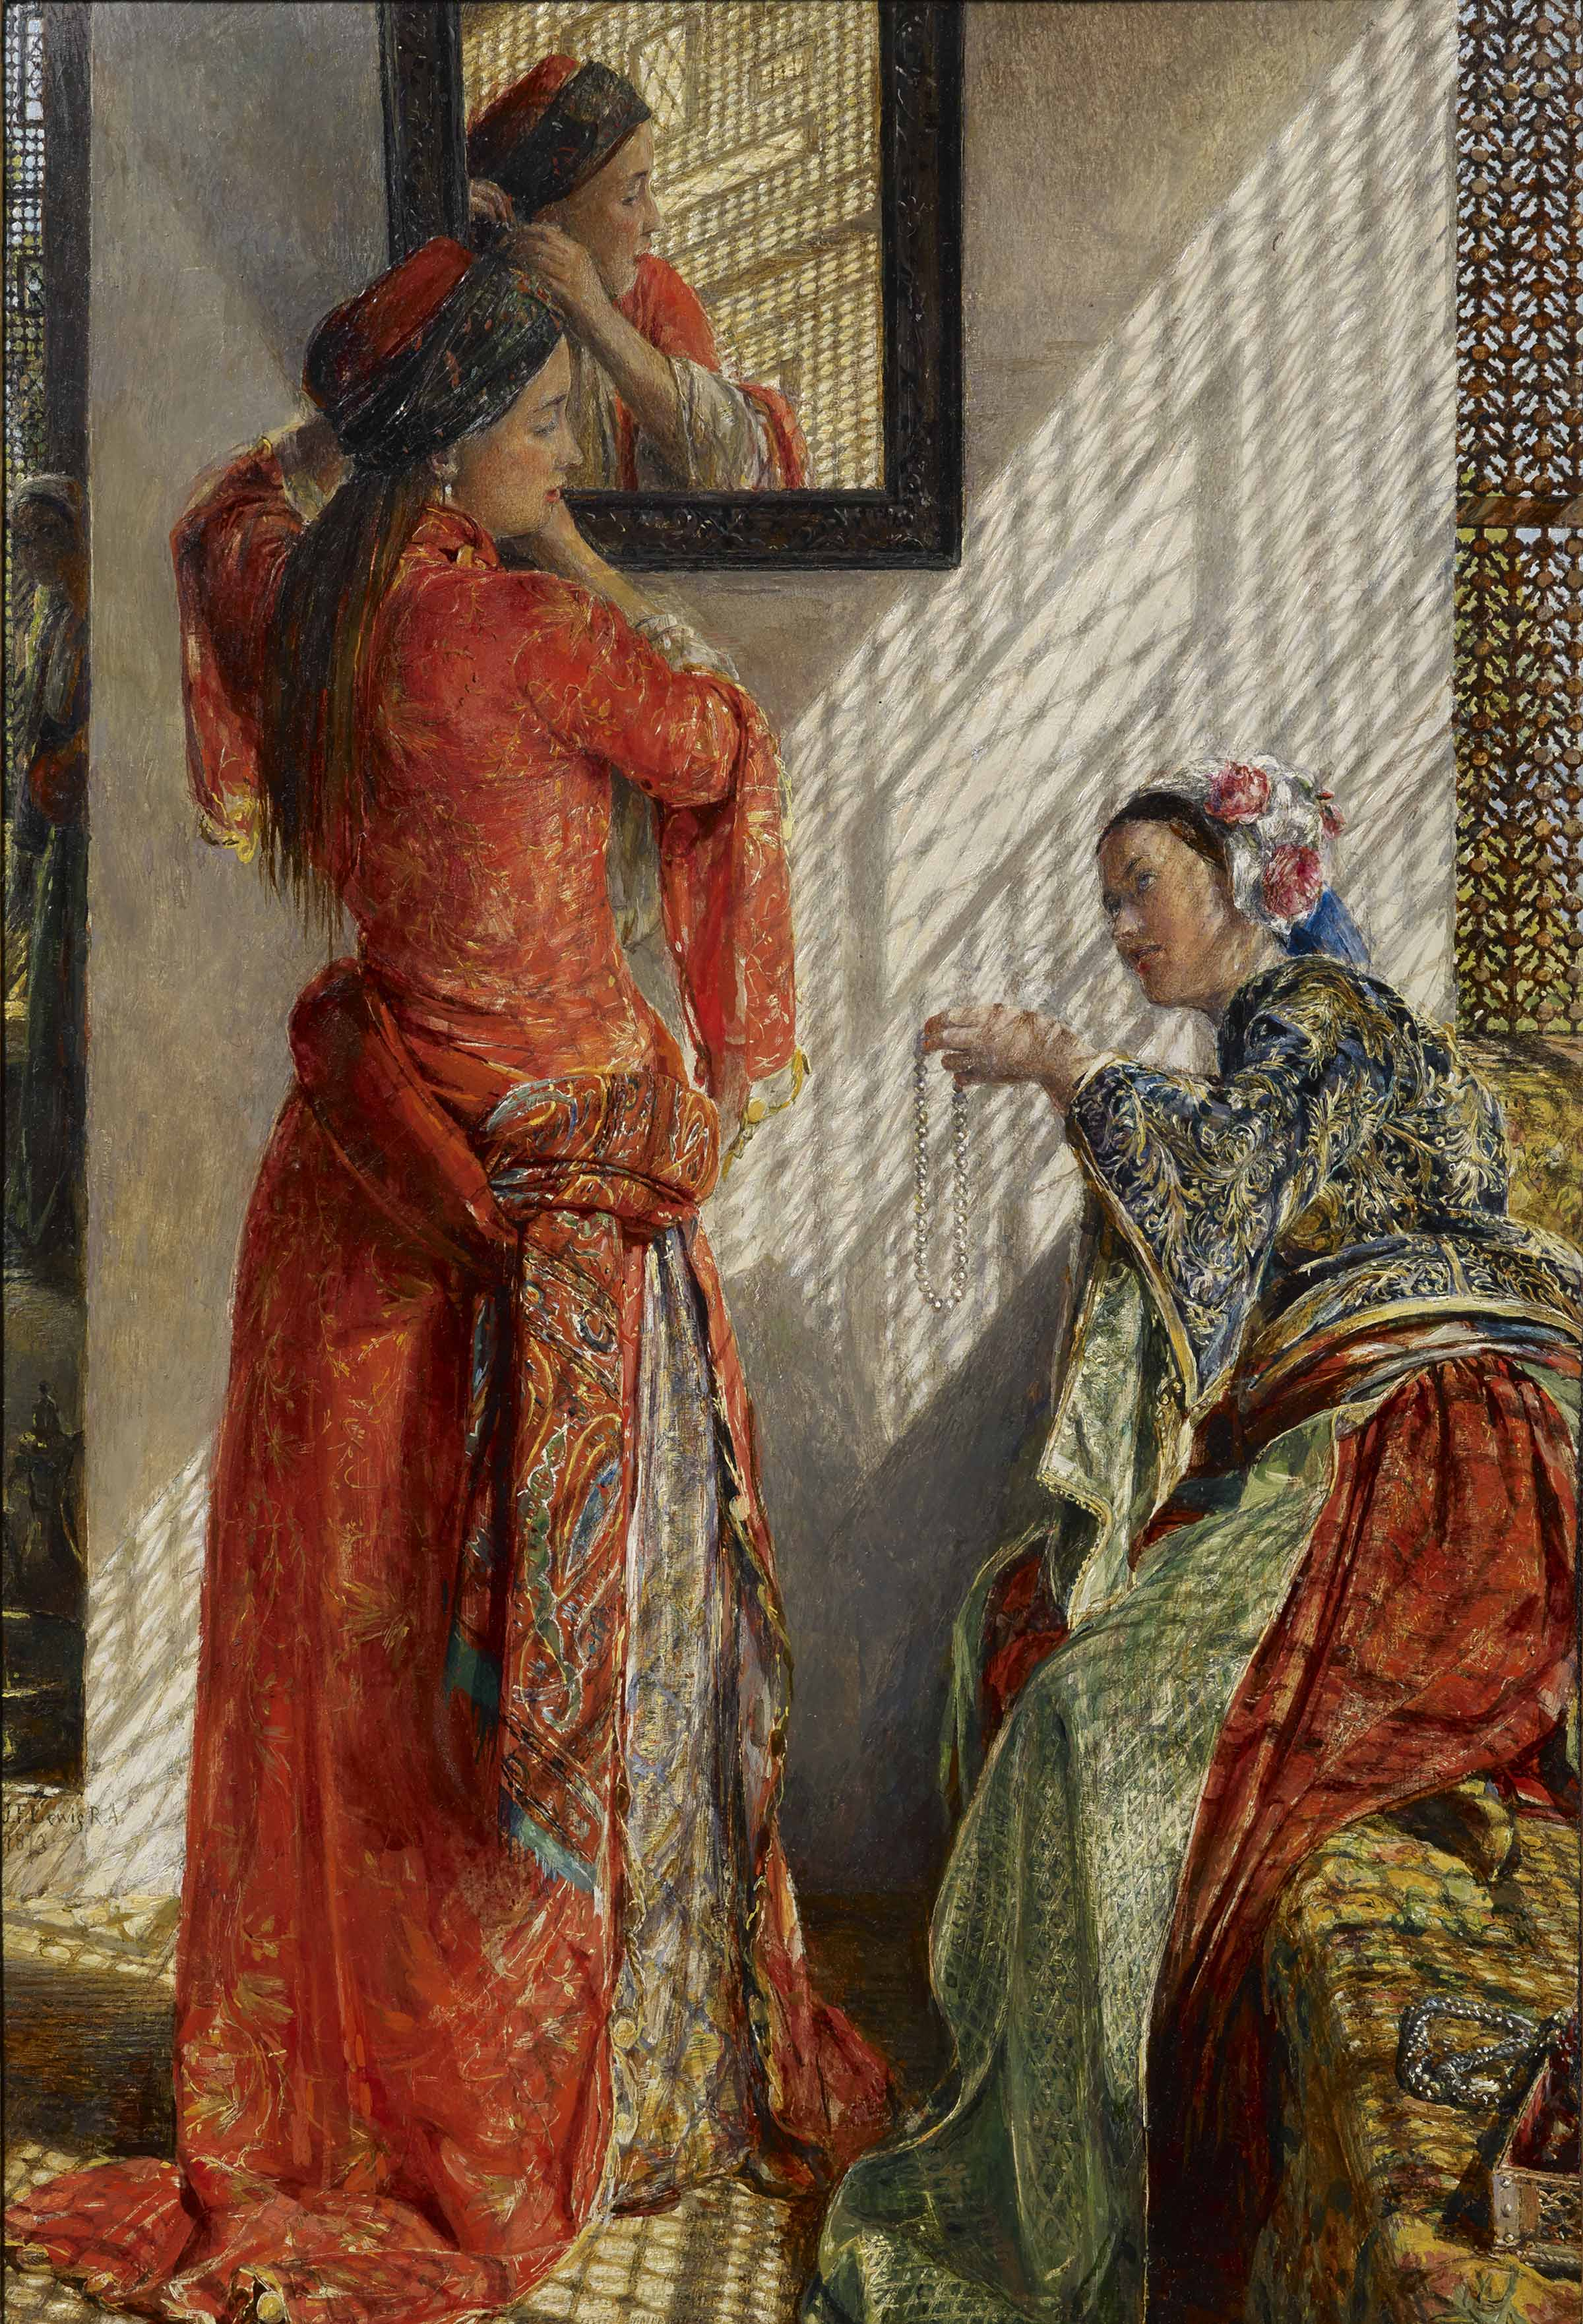 John Frederick Lewis, Indoor Gossip, Cairo (1873), courtesy of The Whitworth